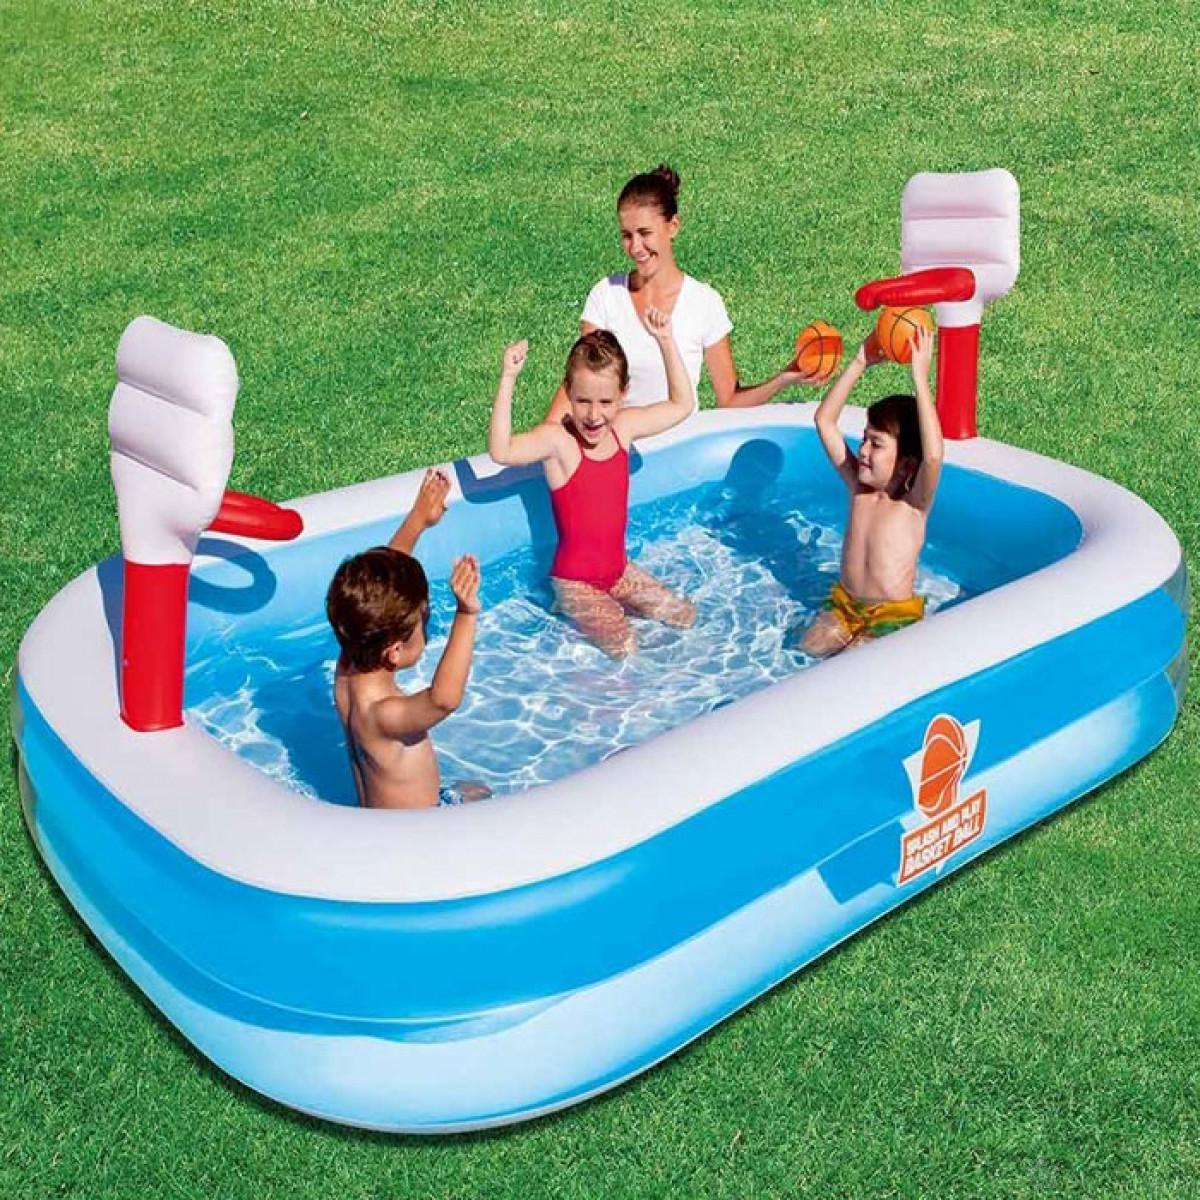 Dečiji bazen košarka, 54122